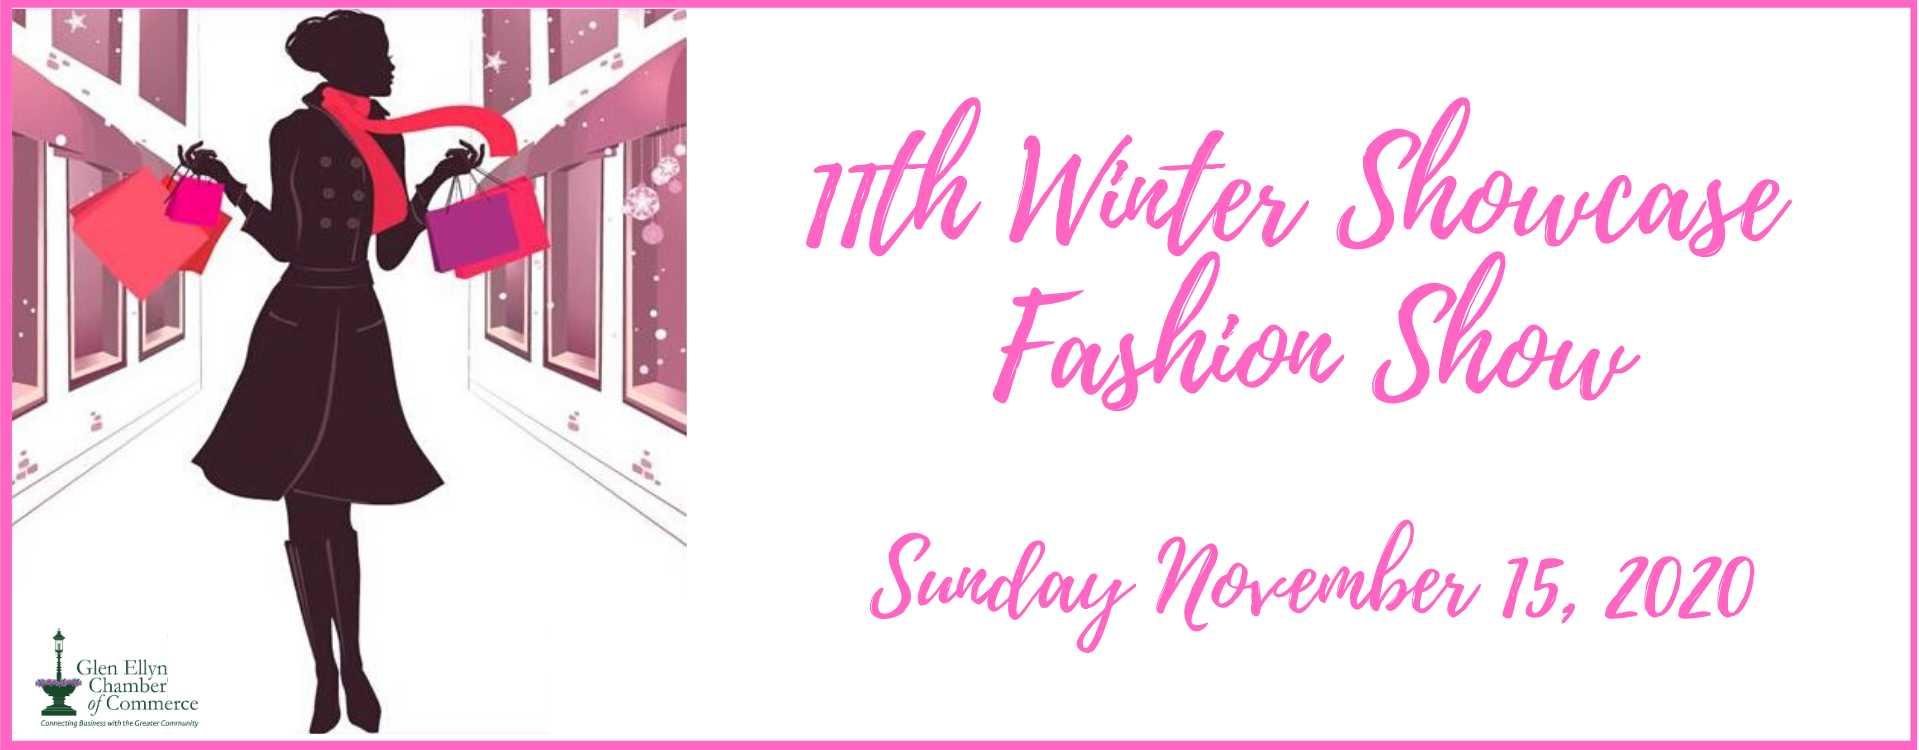 Event Cover Fashion Show 2020